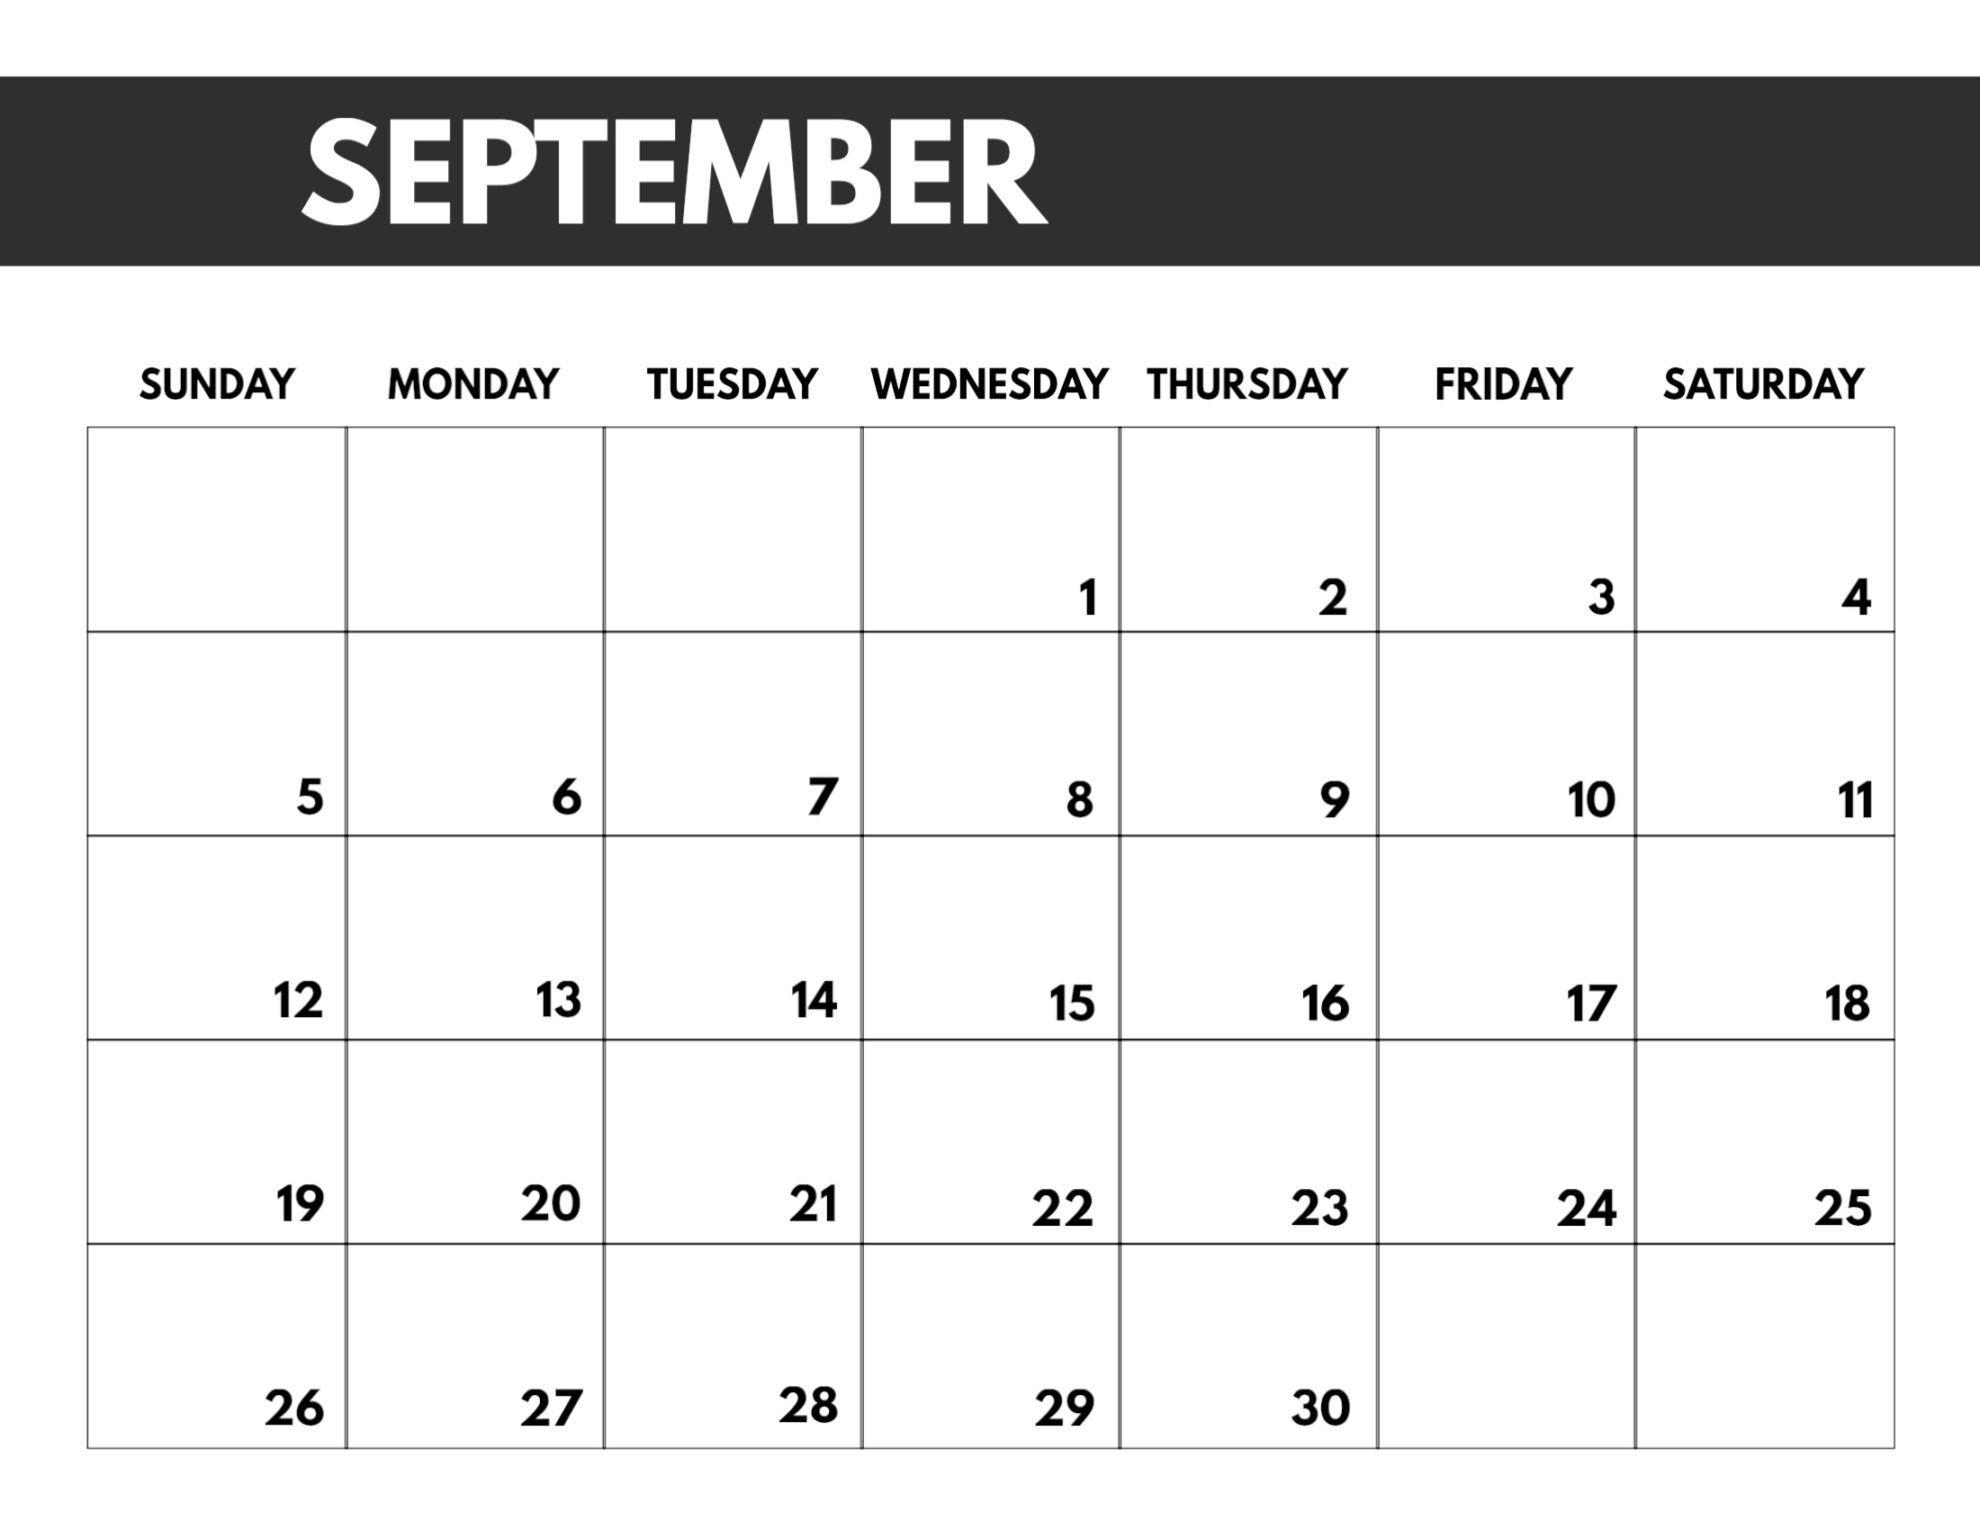 Effective Daily Hourly Calendars To Print | Get Your Calendar Printable regarding Multi-Dose Vial Expiration Calculator 2021 Graphics